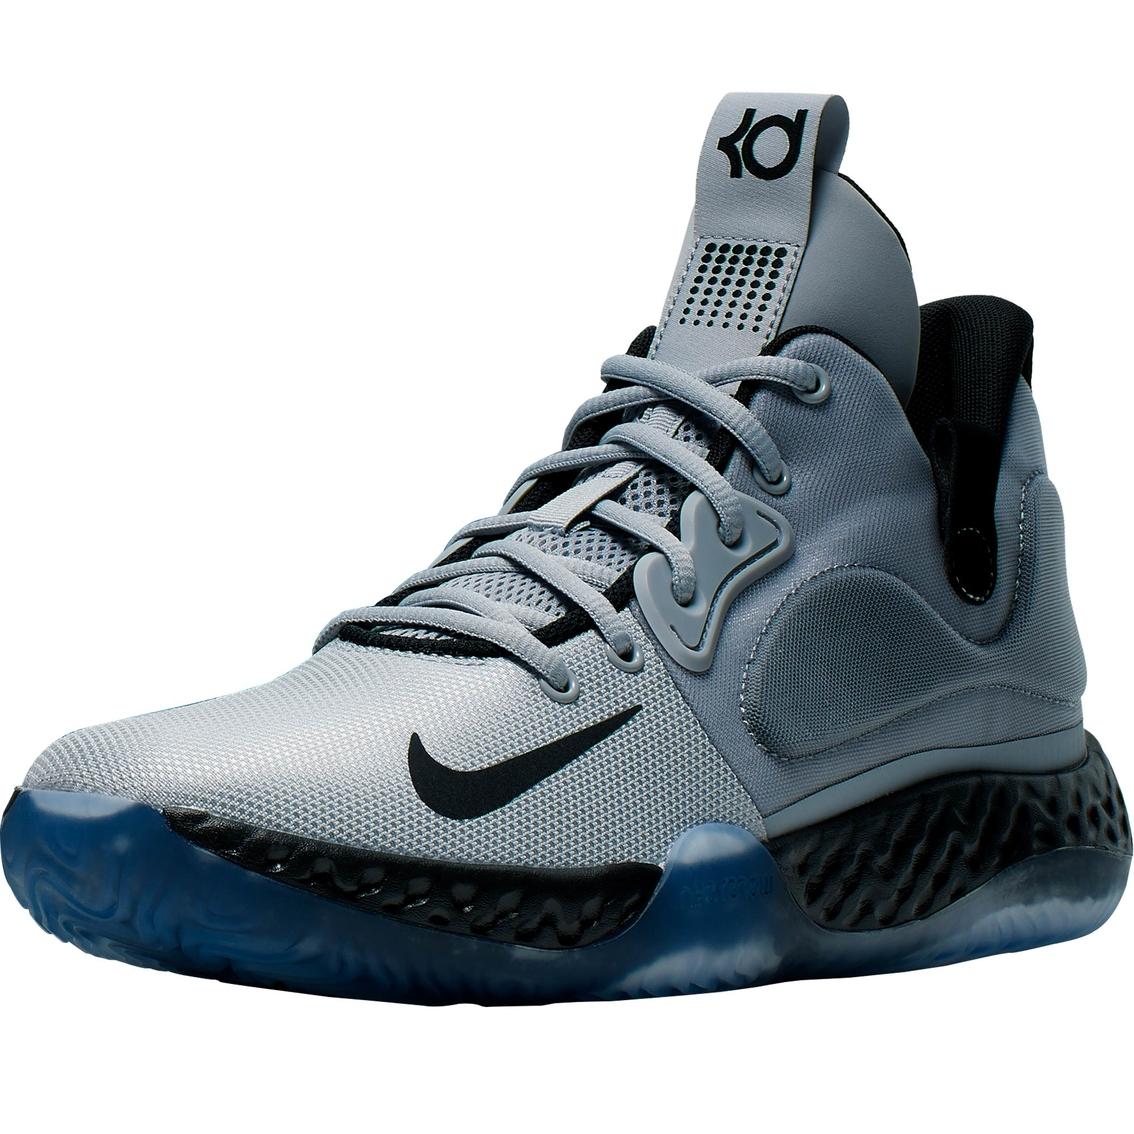 on sale b2f78 e91e6 Nike Men's Kd Trey 5 Vii Basketball Shoes   Basketball ...